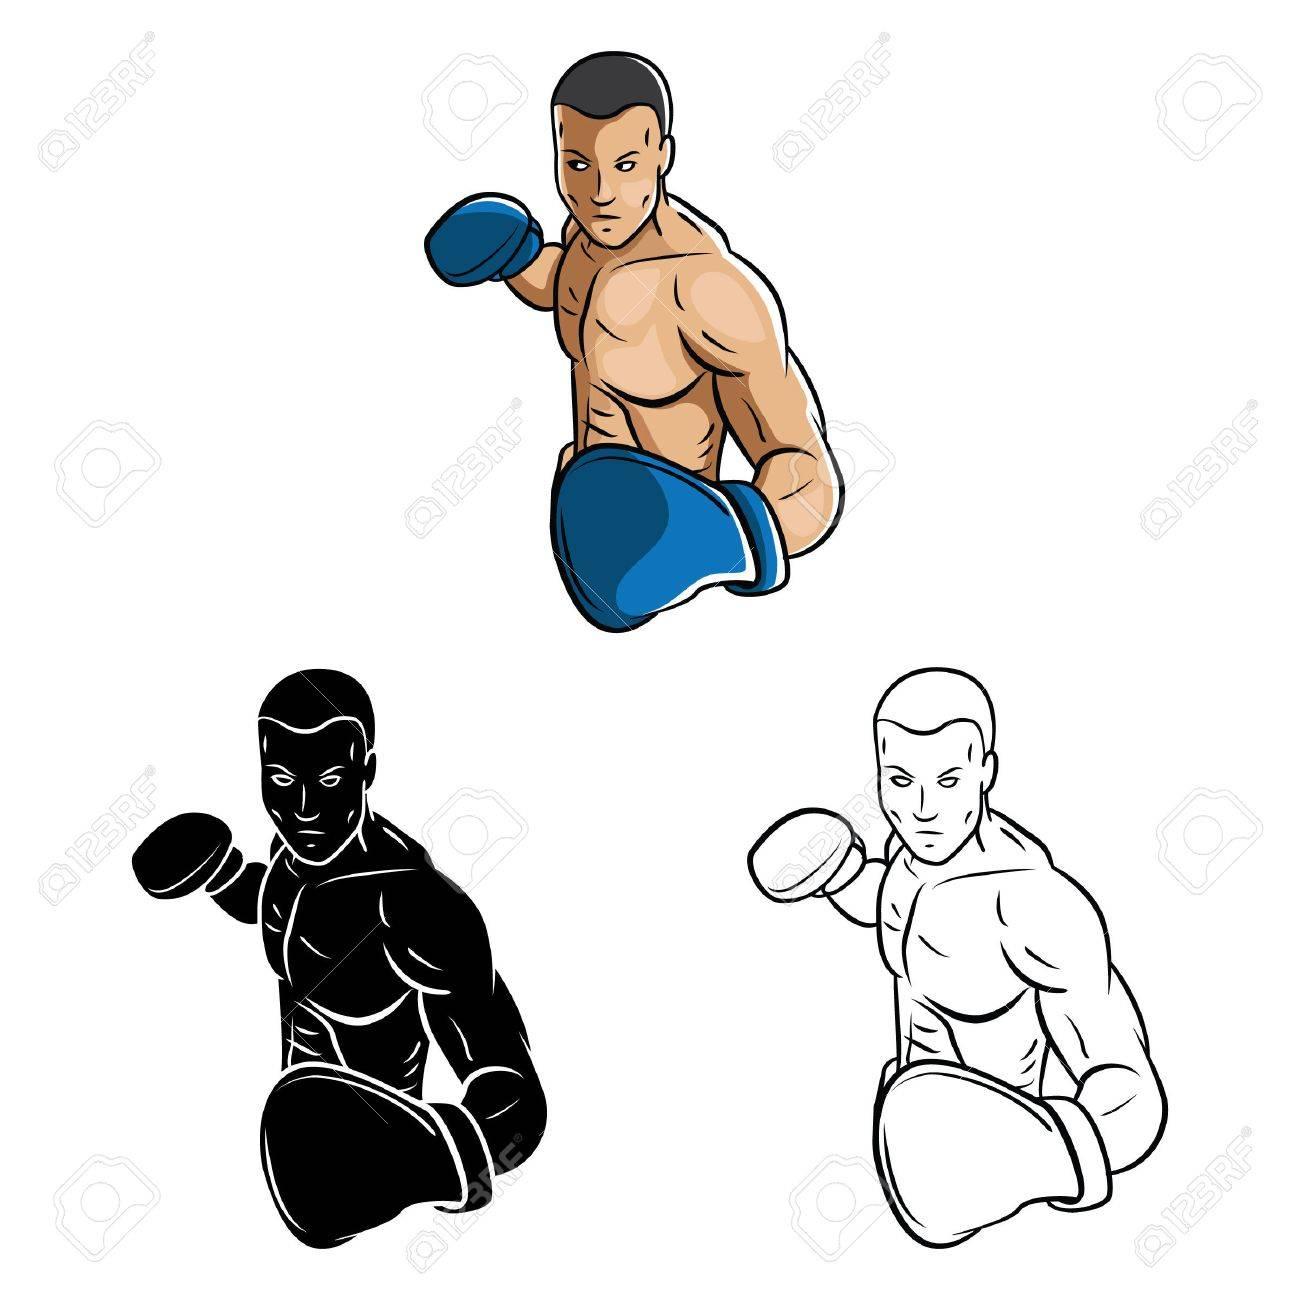 Personaje De Dibujos Animados Para Colorear Libro Boxeador